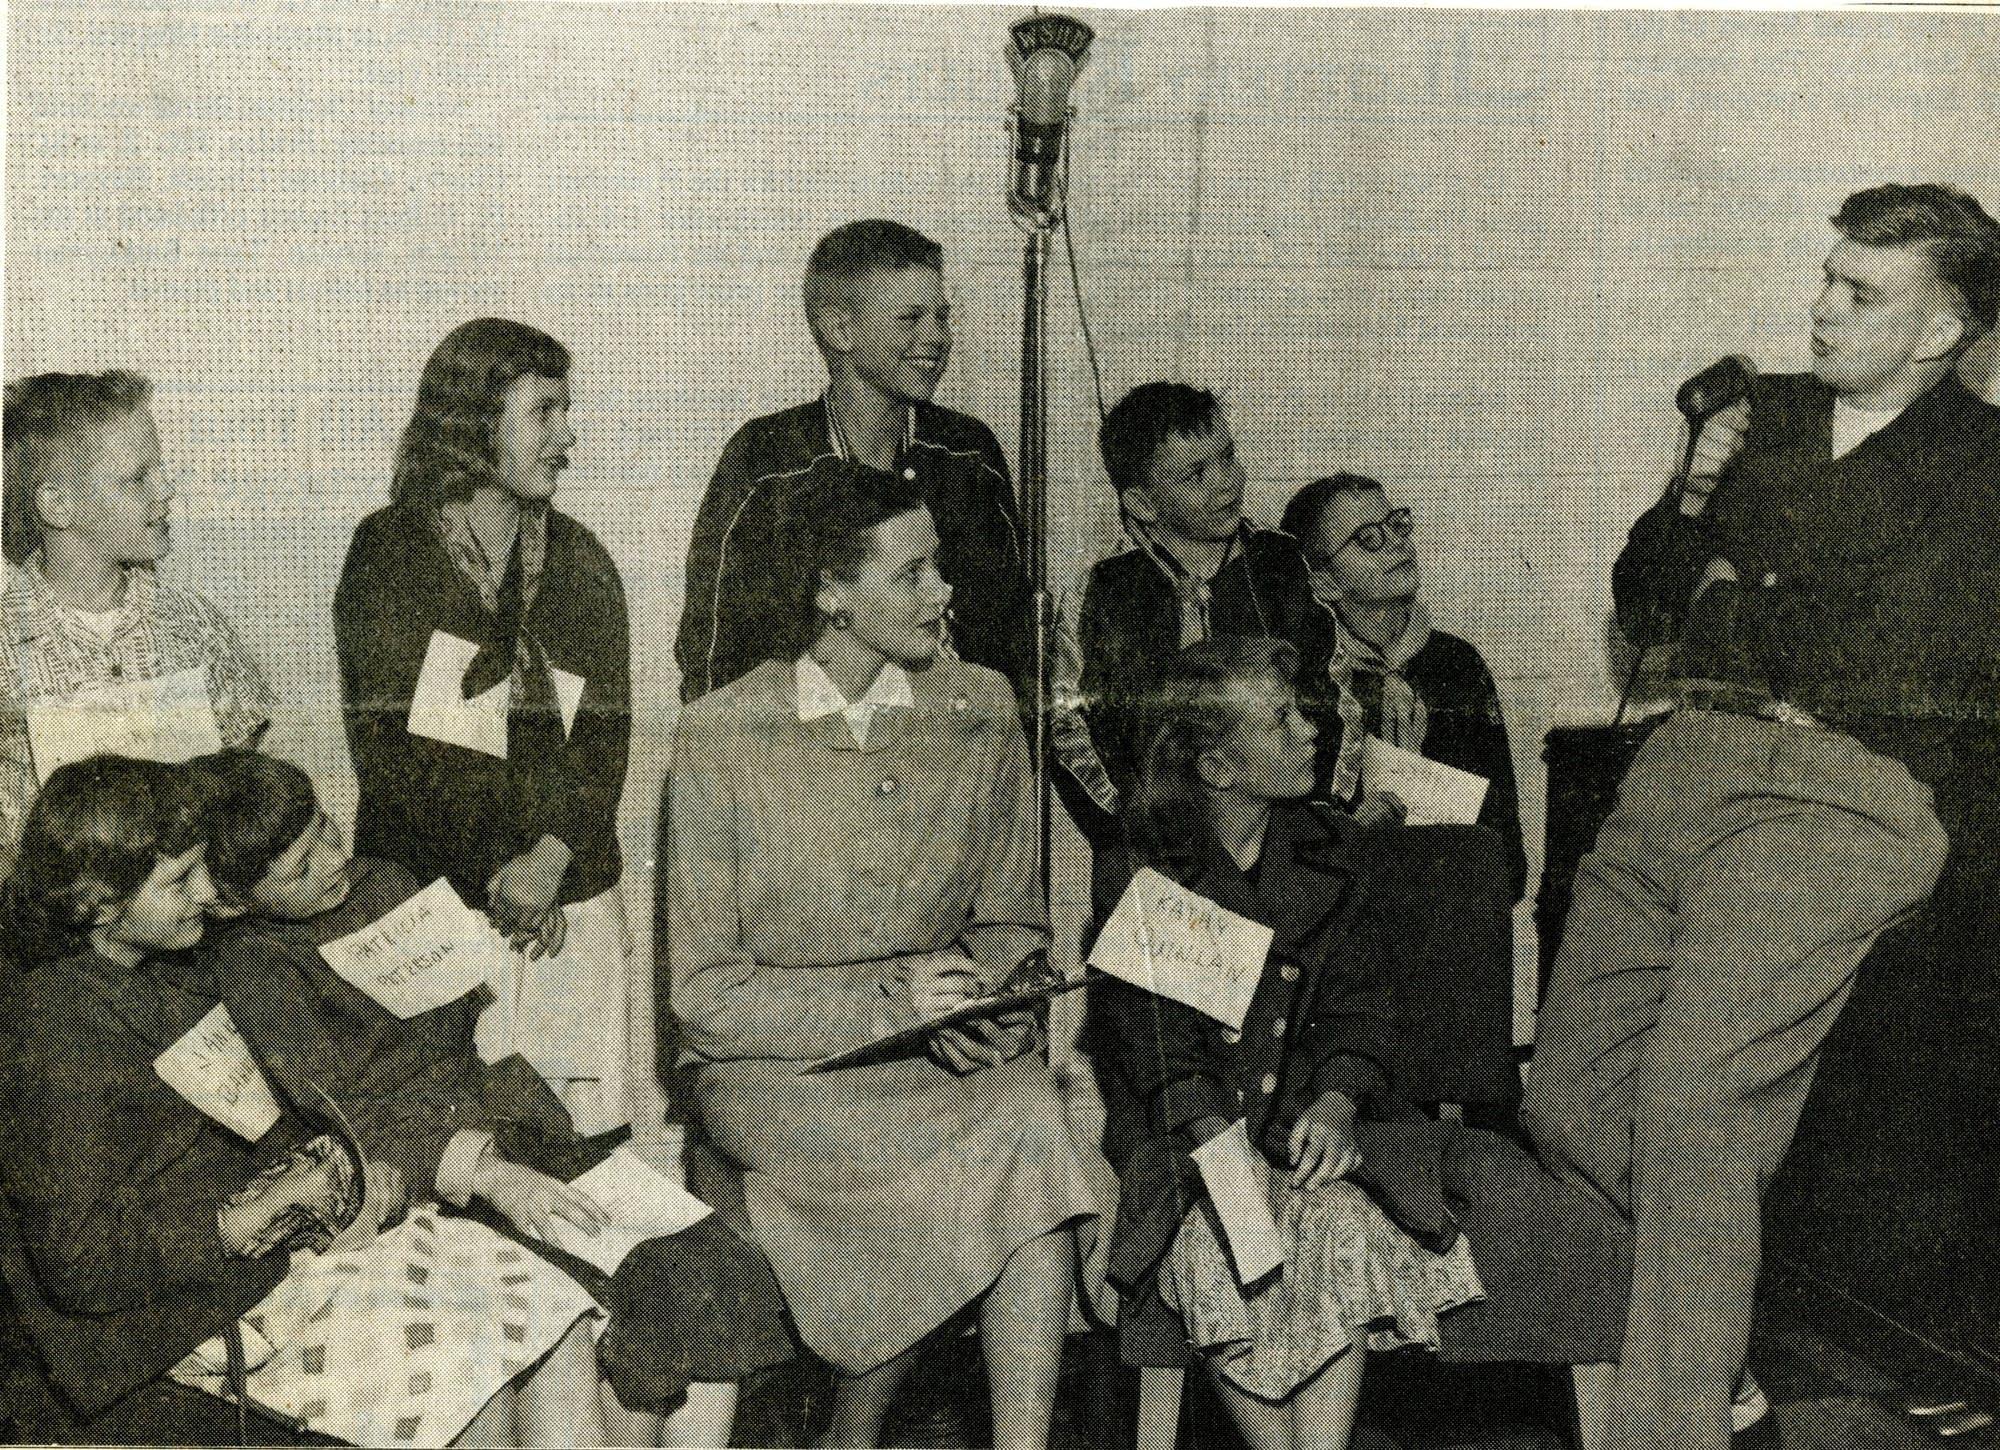 Anita Buck and Roger Erickson entertain local children